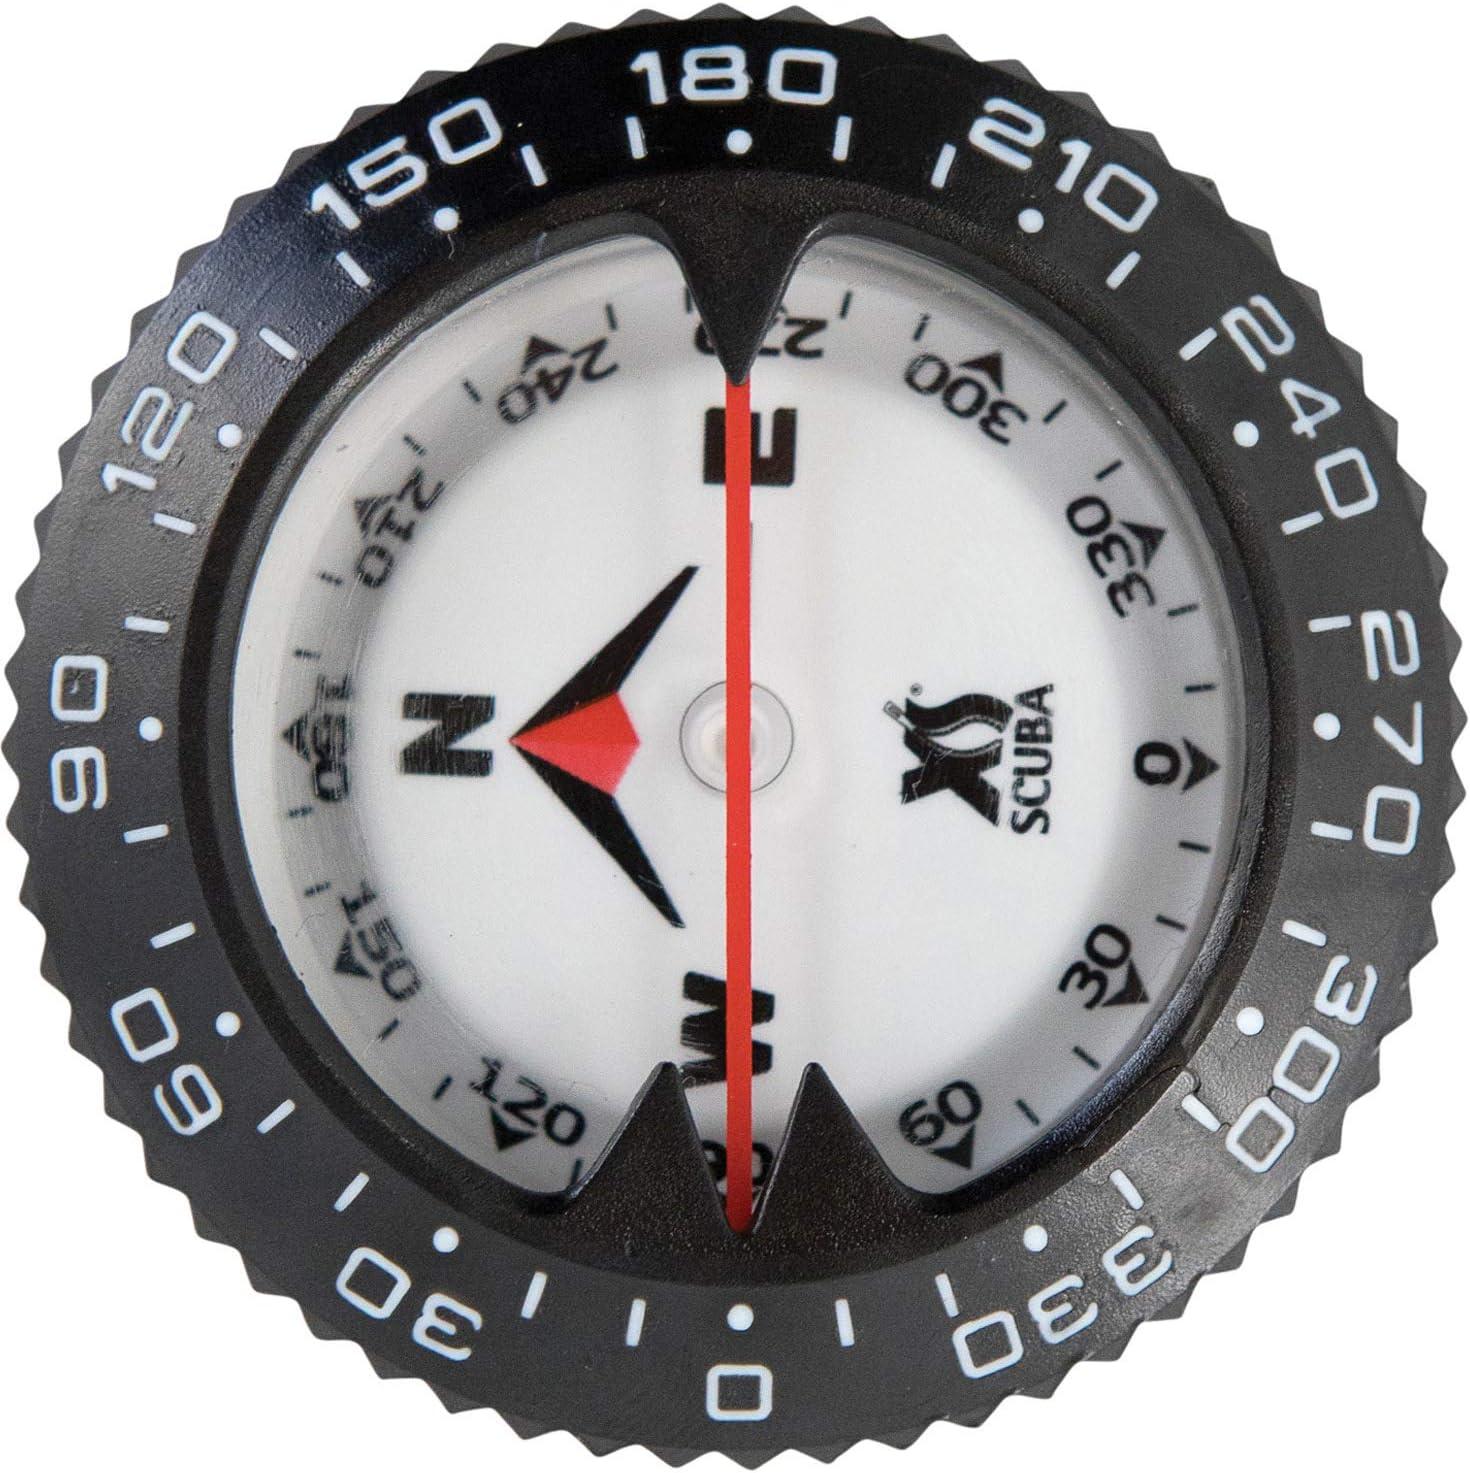 Outdoor Scuba Compass Wrist Console Navigation Gauge Dive Diving Water Sports